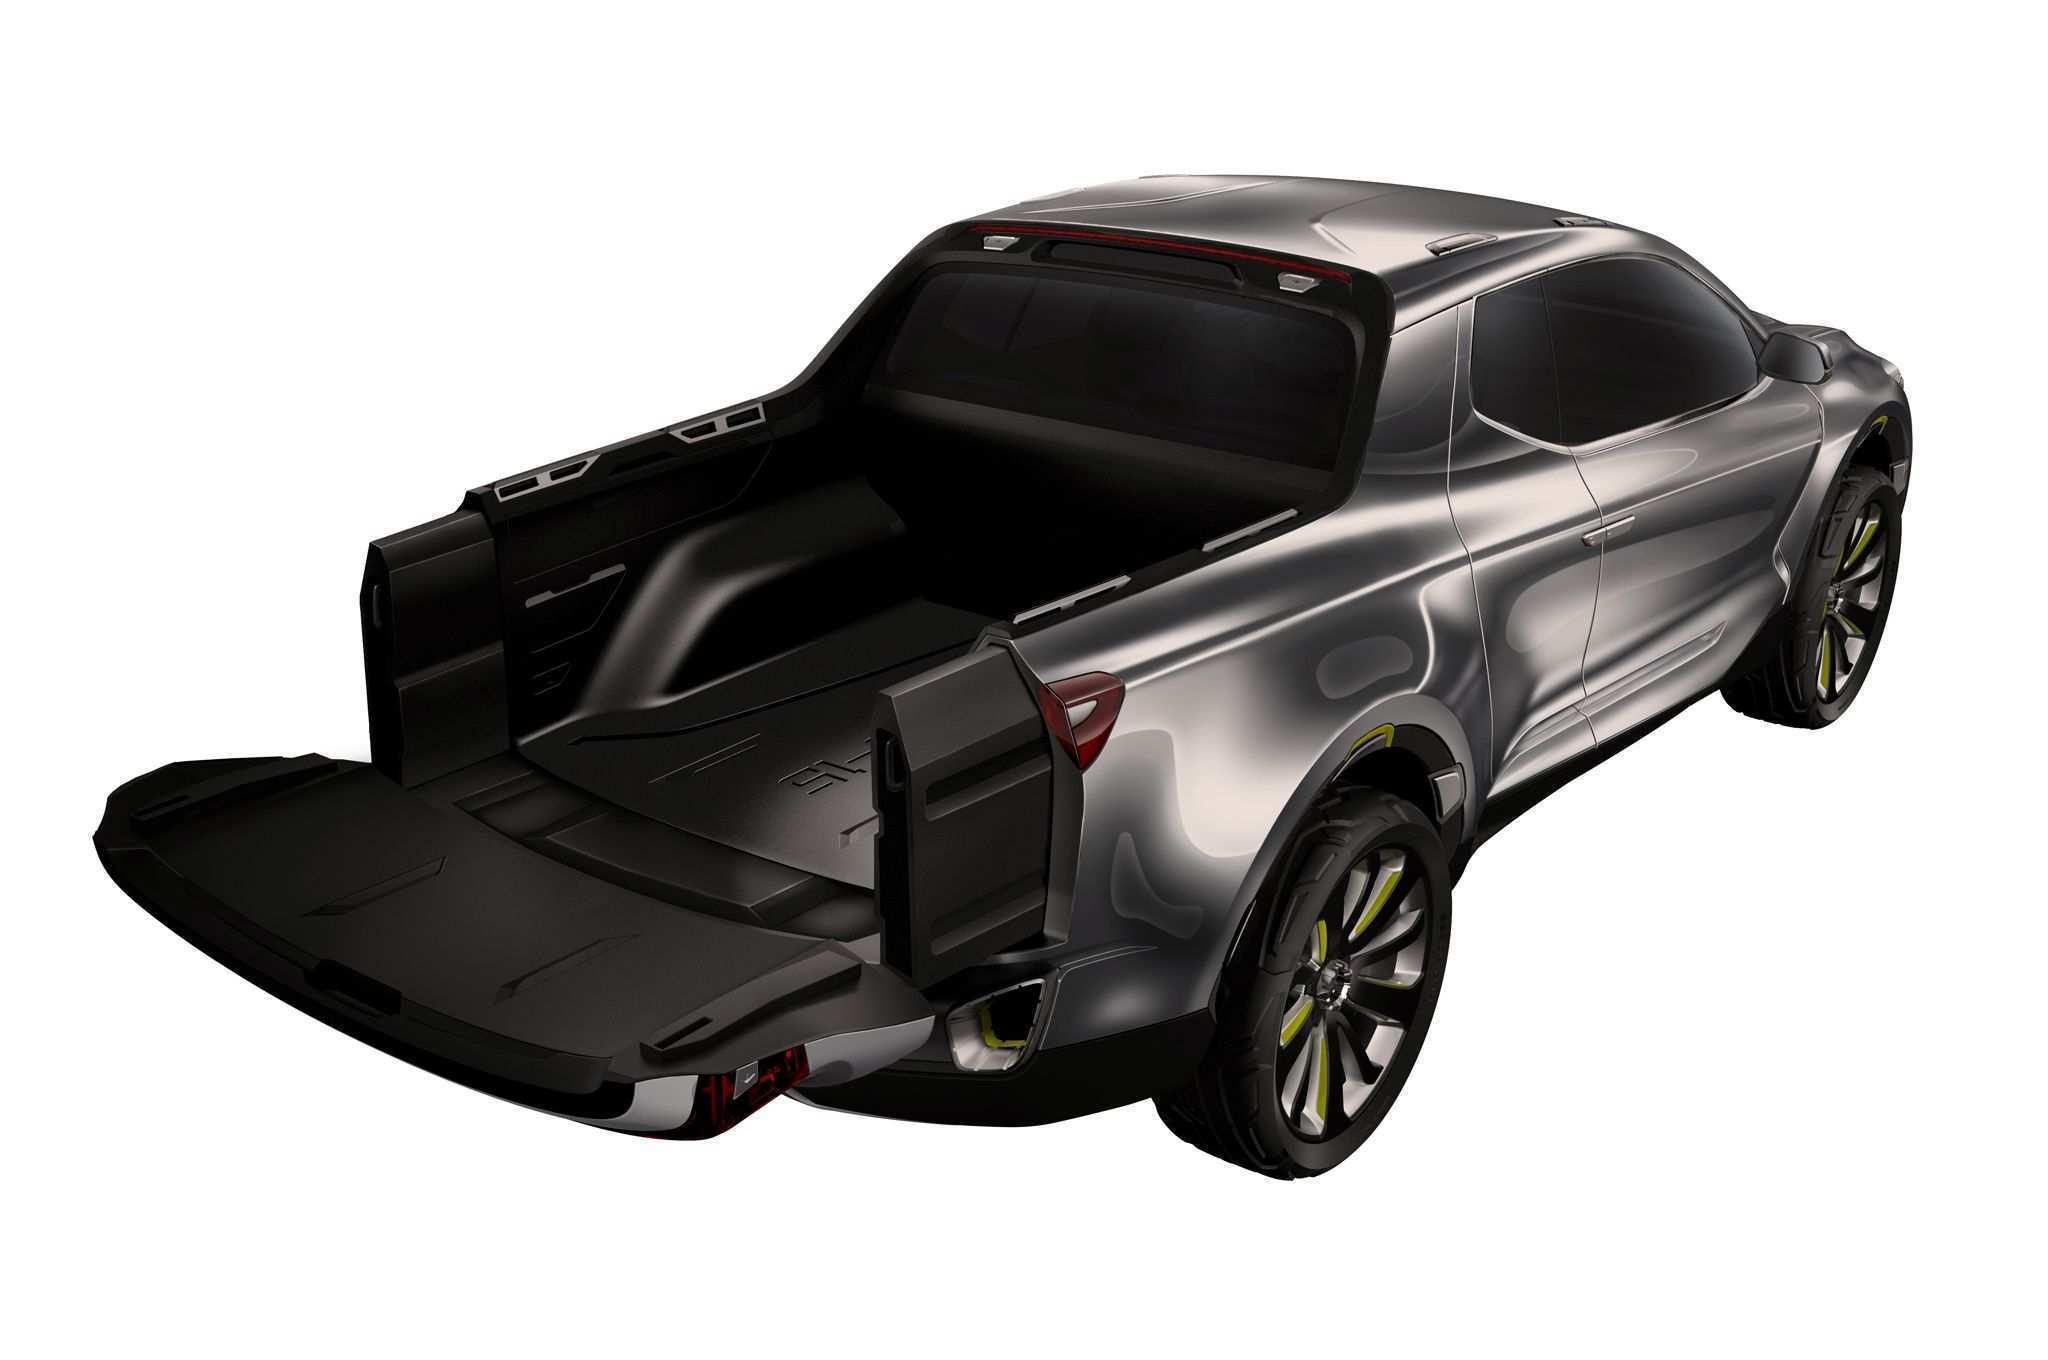 56 Concept of 2019 Hyundai Santa Cruz Pickup Exterior and Interior for 2019 Hyundai Santa Cruz Pickup